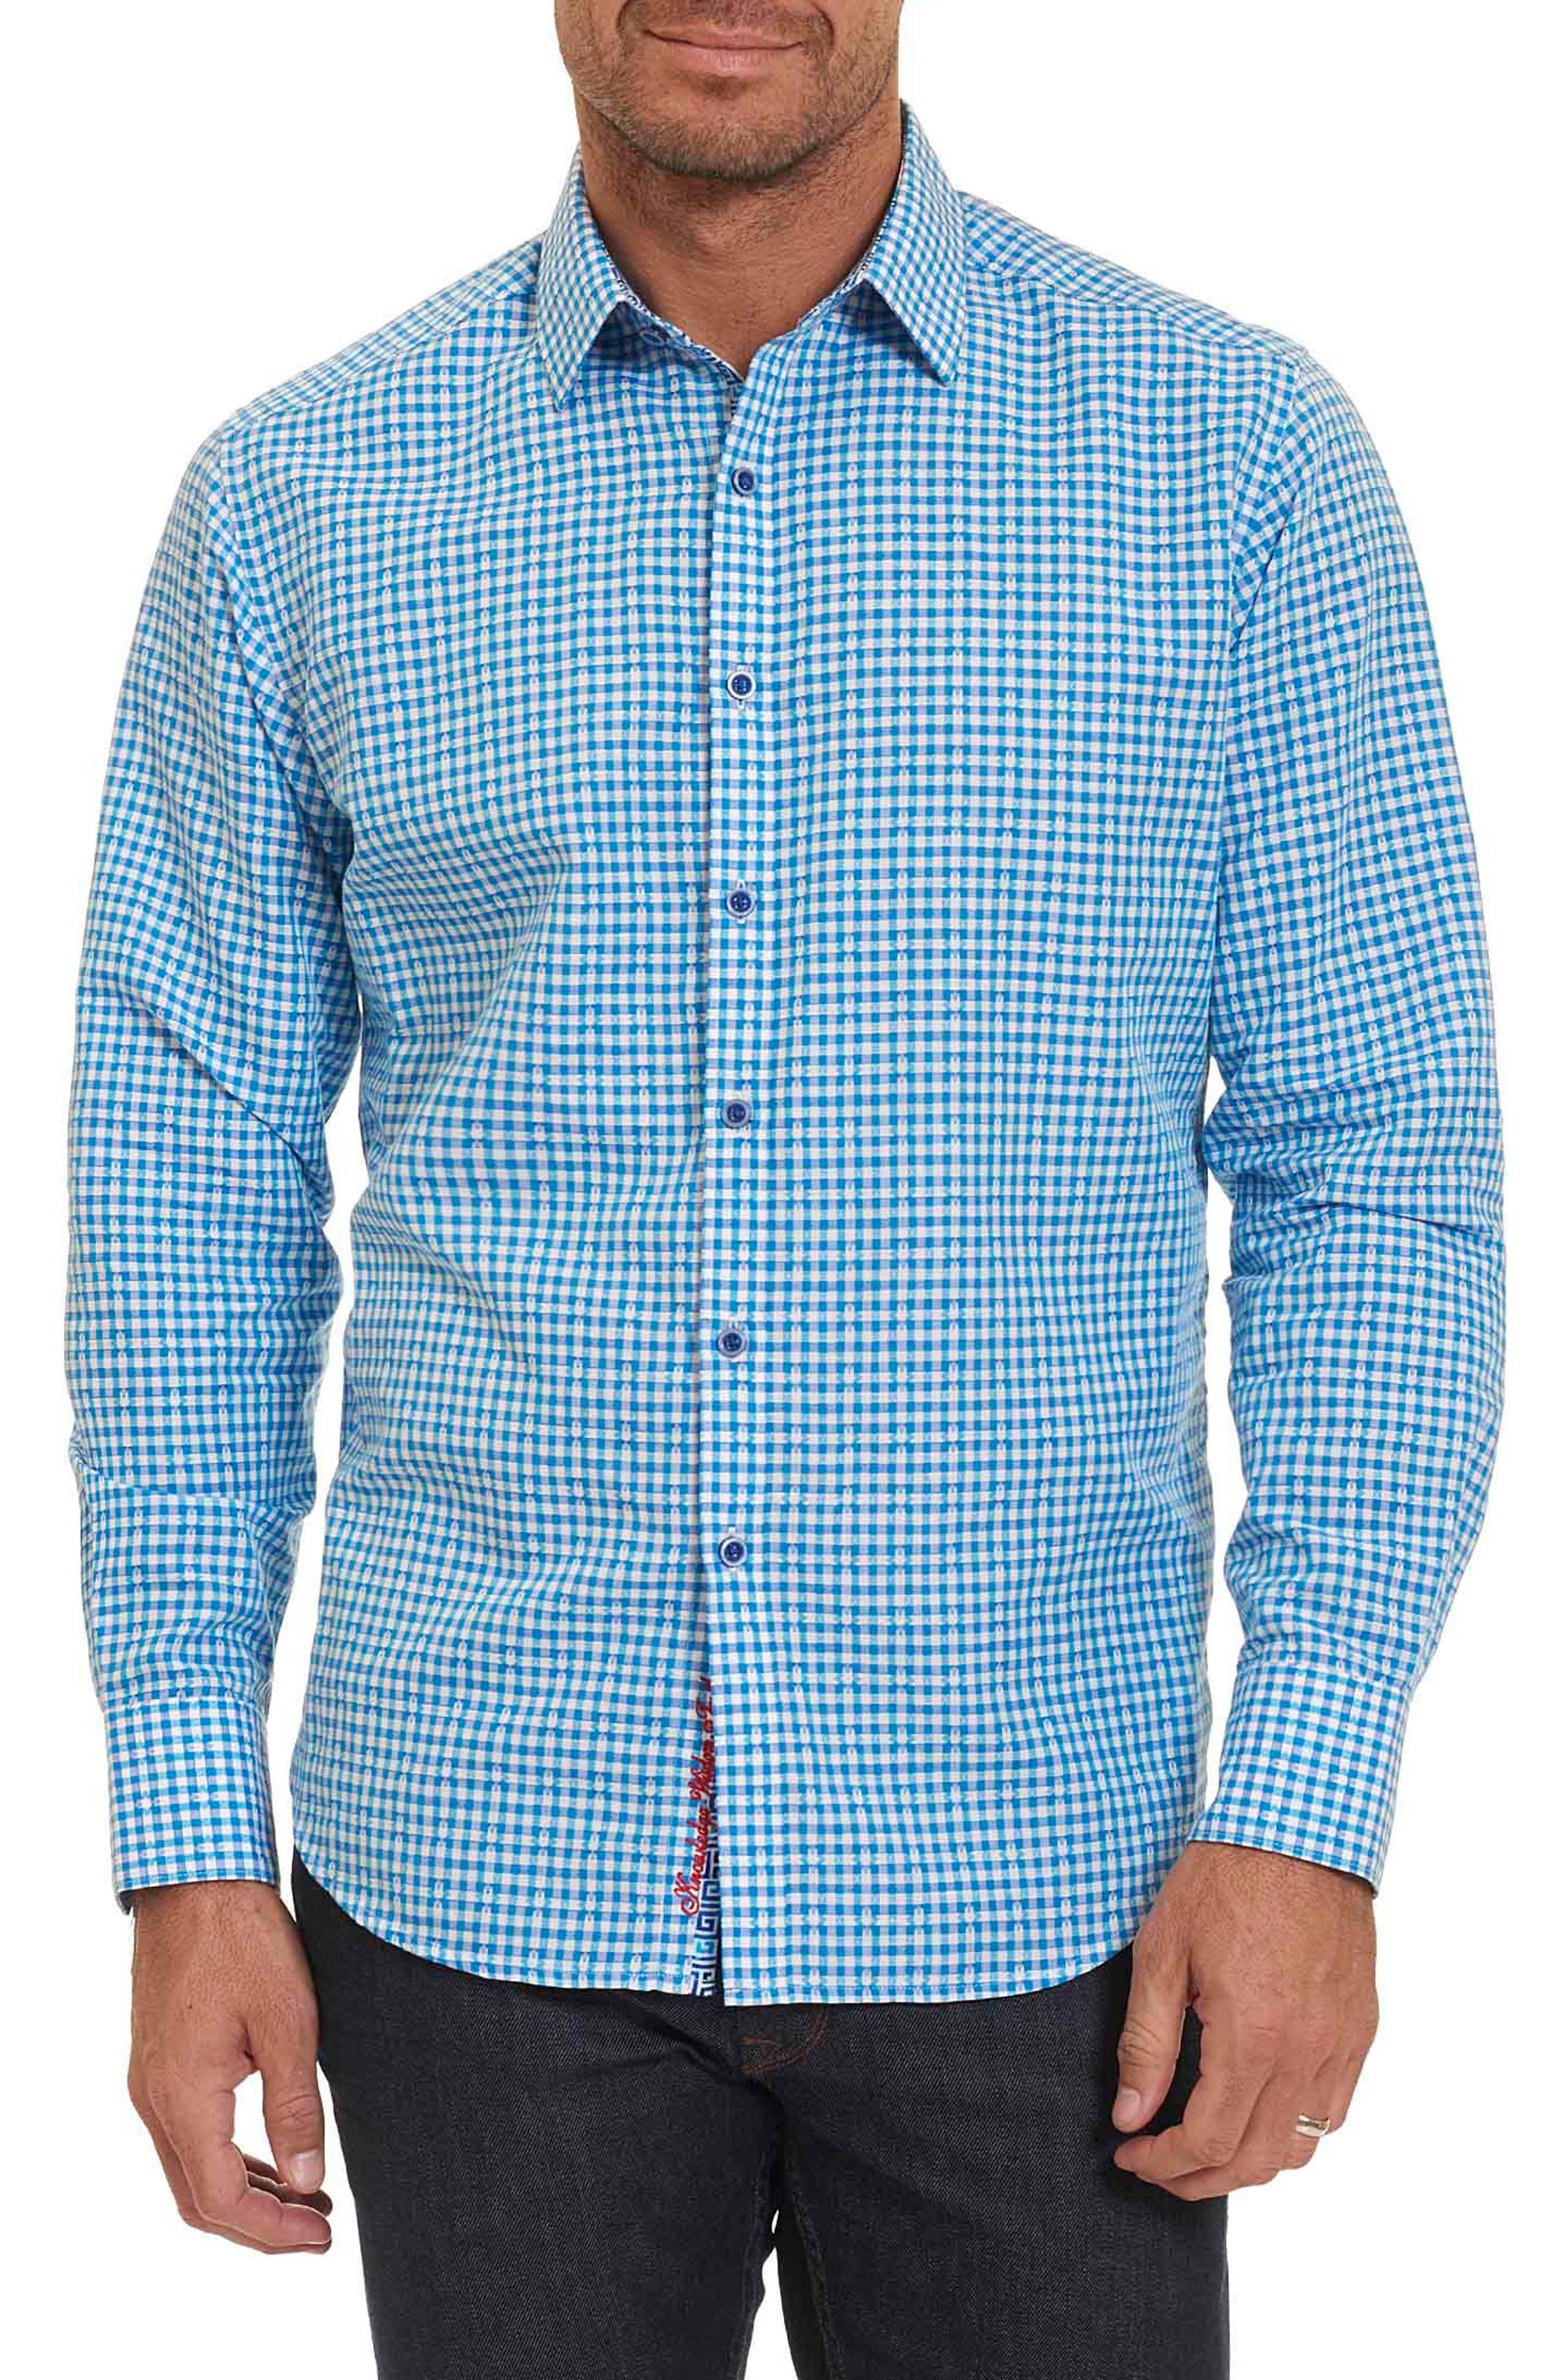 Main Image - Robert Graham La Monica Classic Fit Gingham Linen & Cotton Sport Shirt